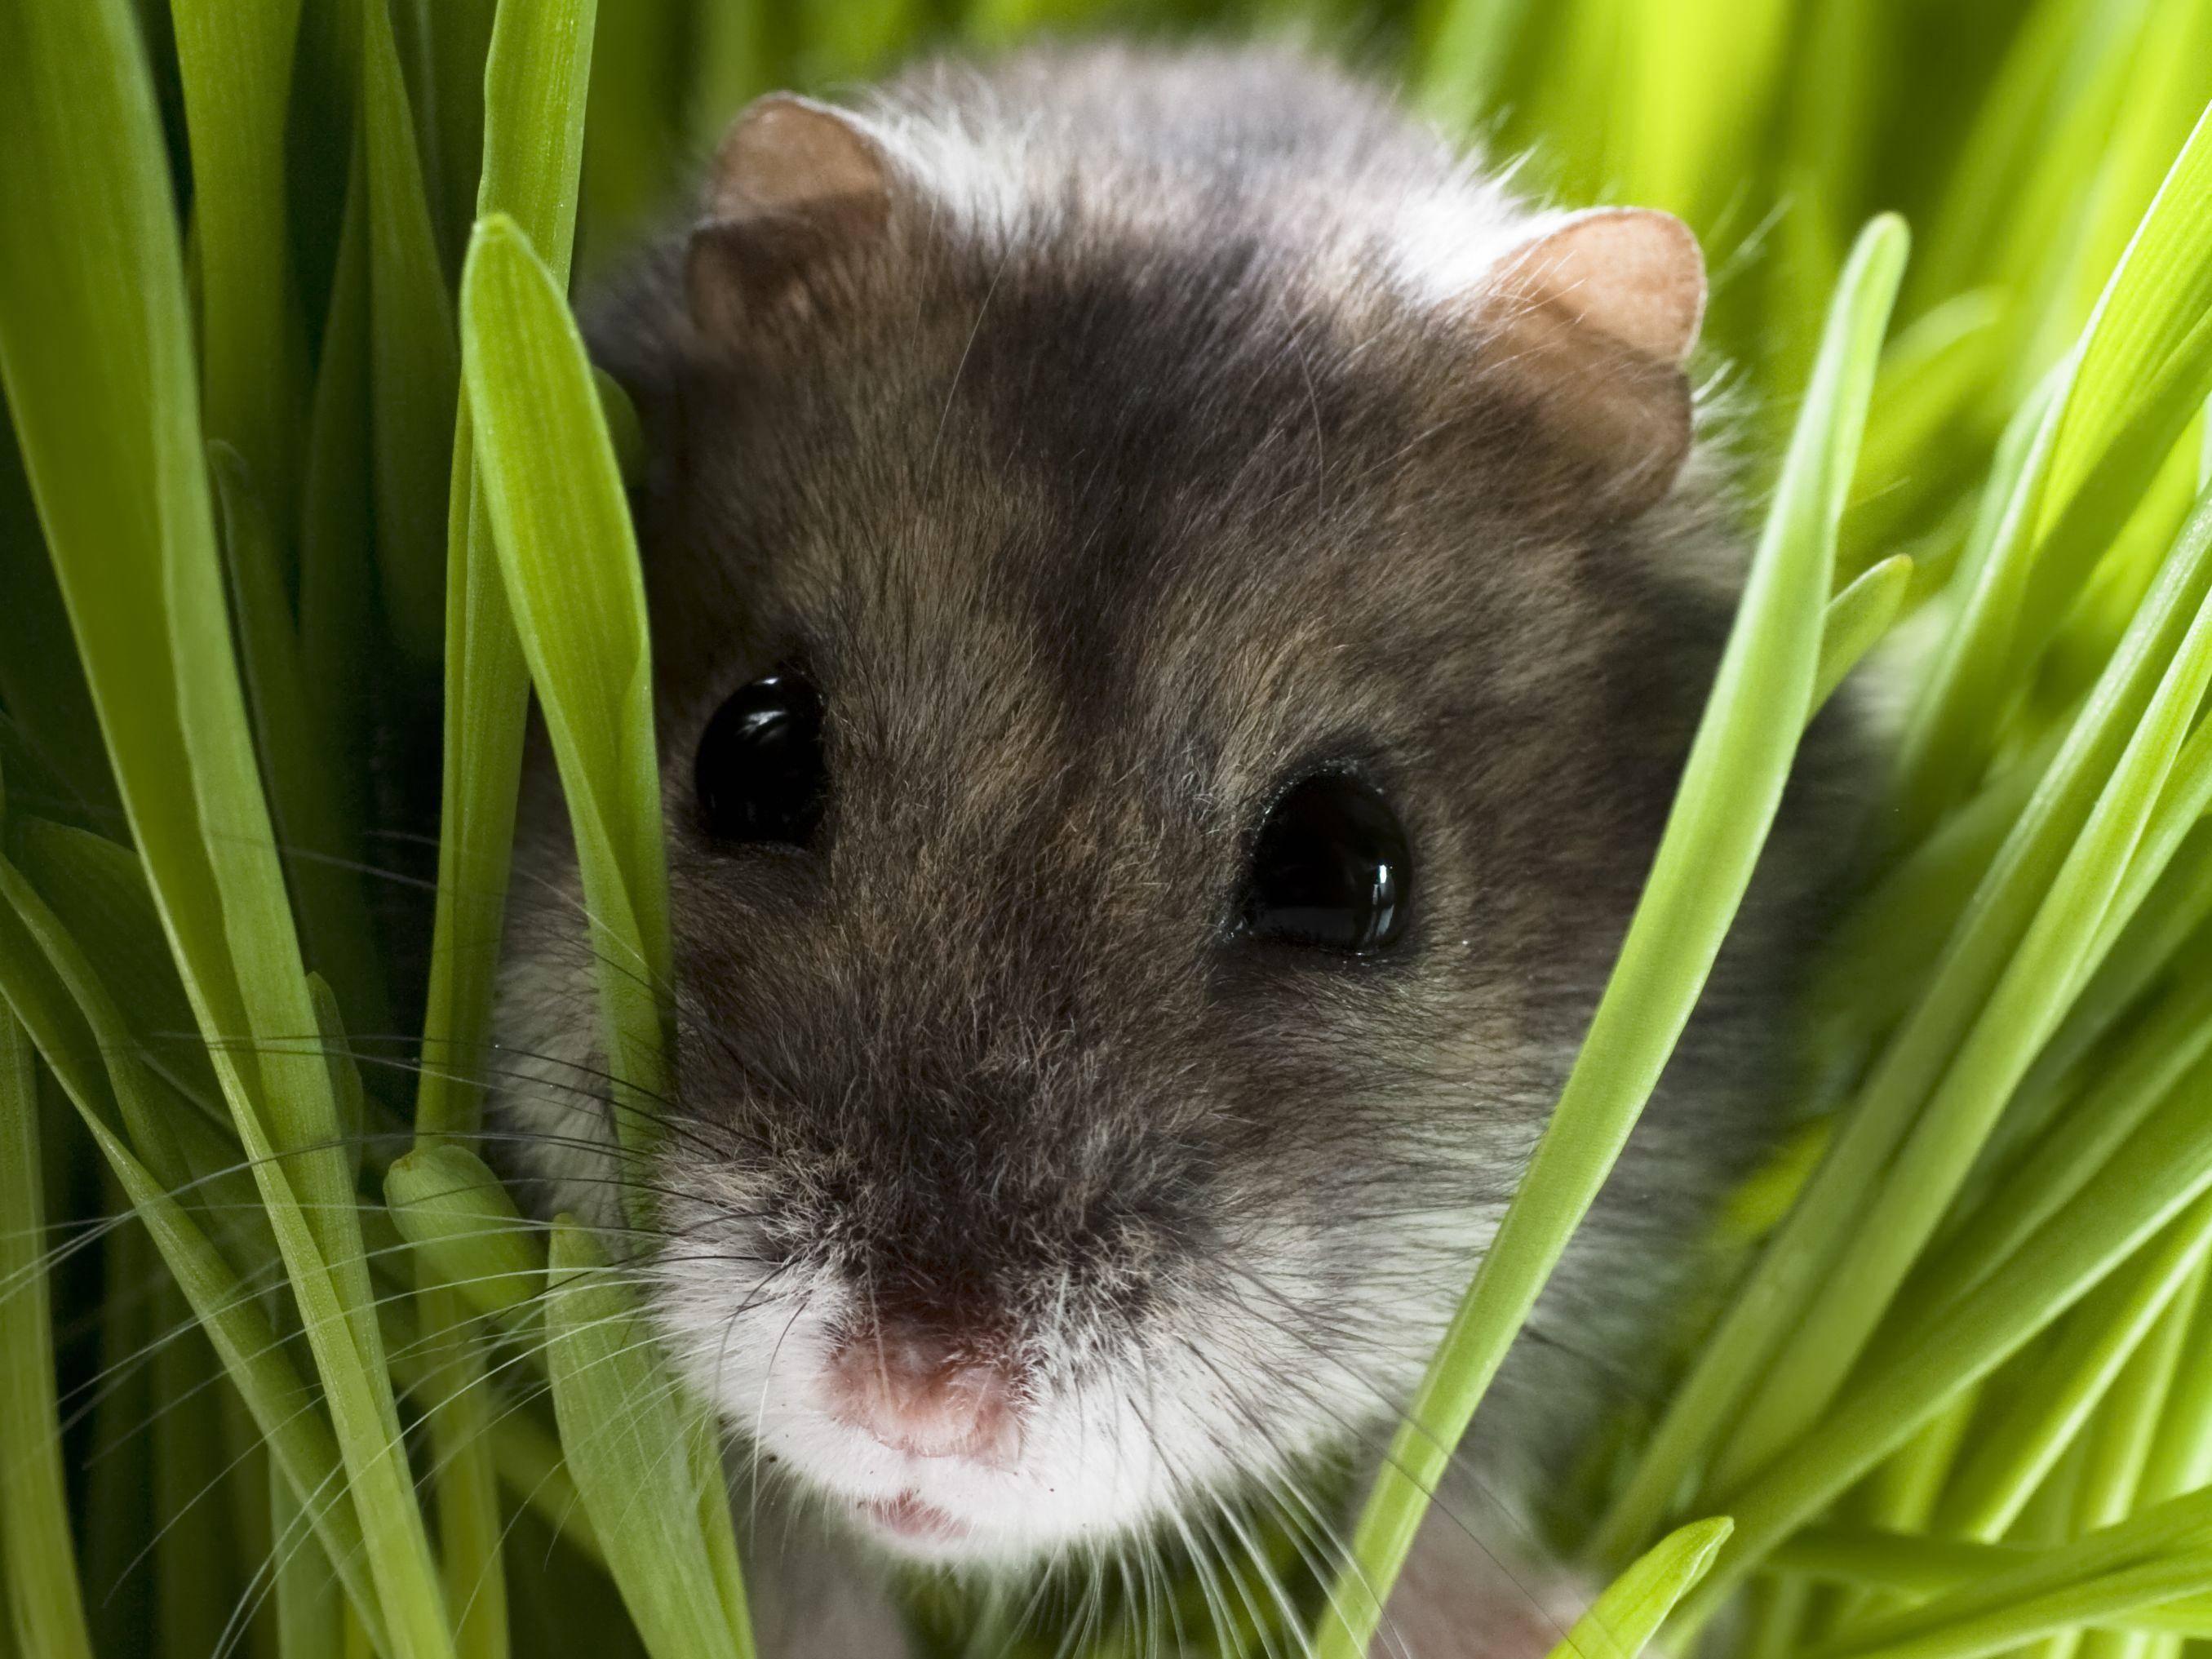 Hamster: Der kleinste Nager unter den Haustieren — Bild: Shutterstock / MilousSK